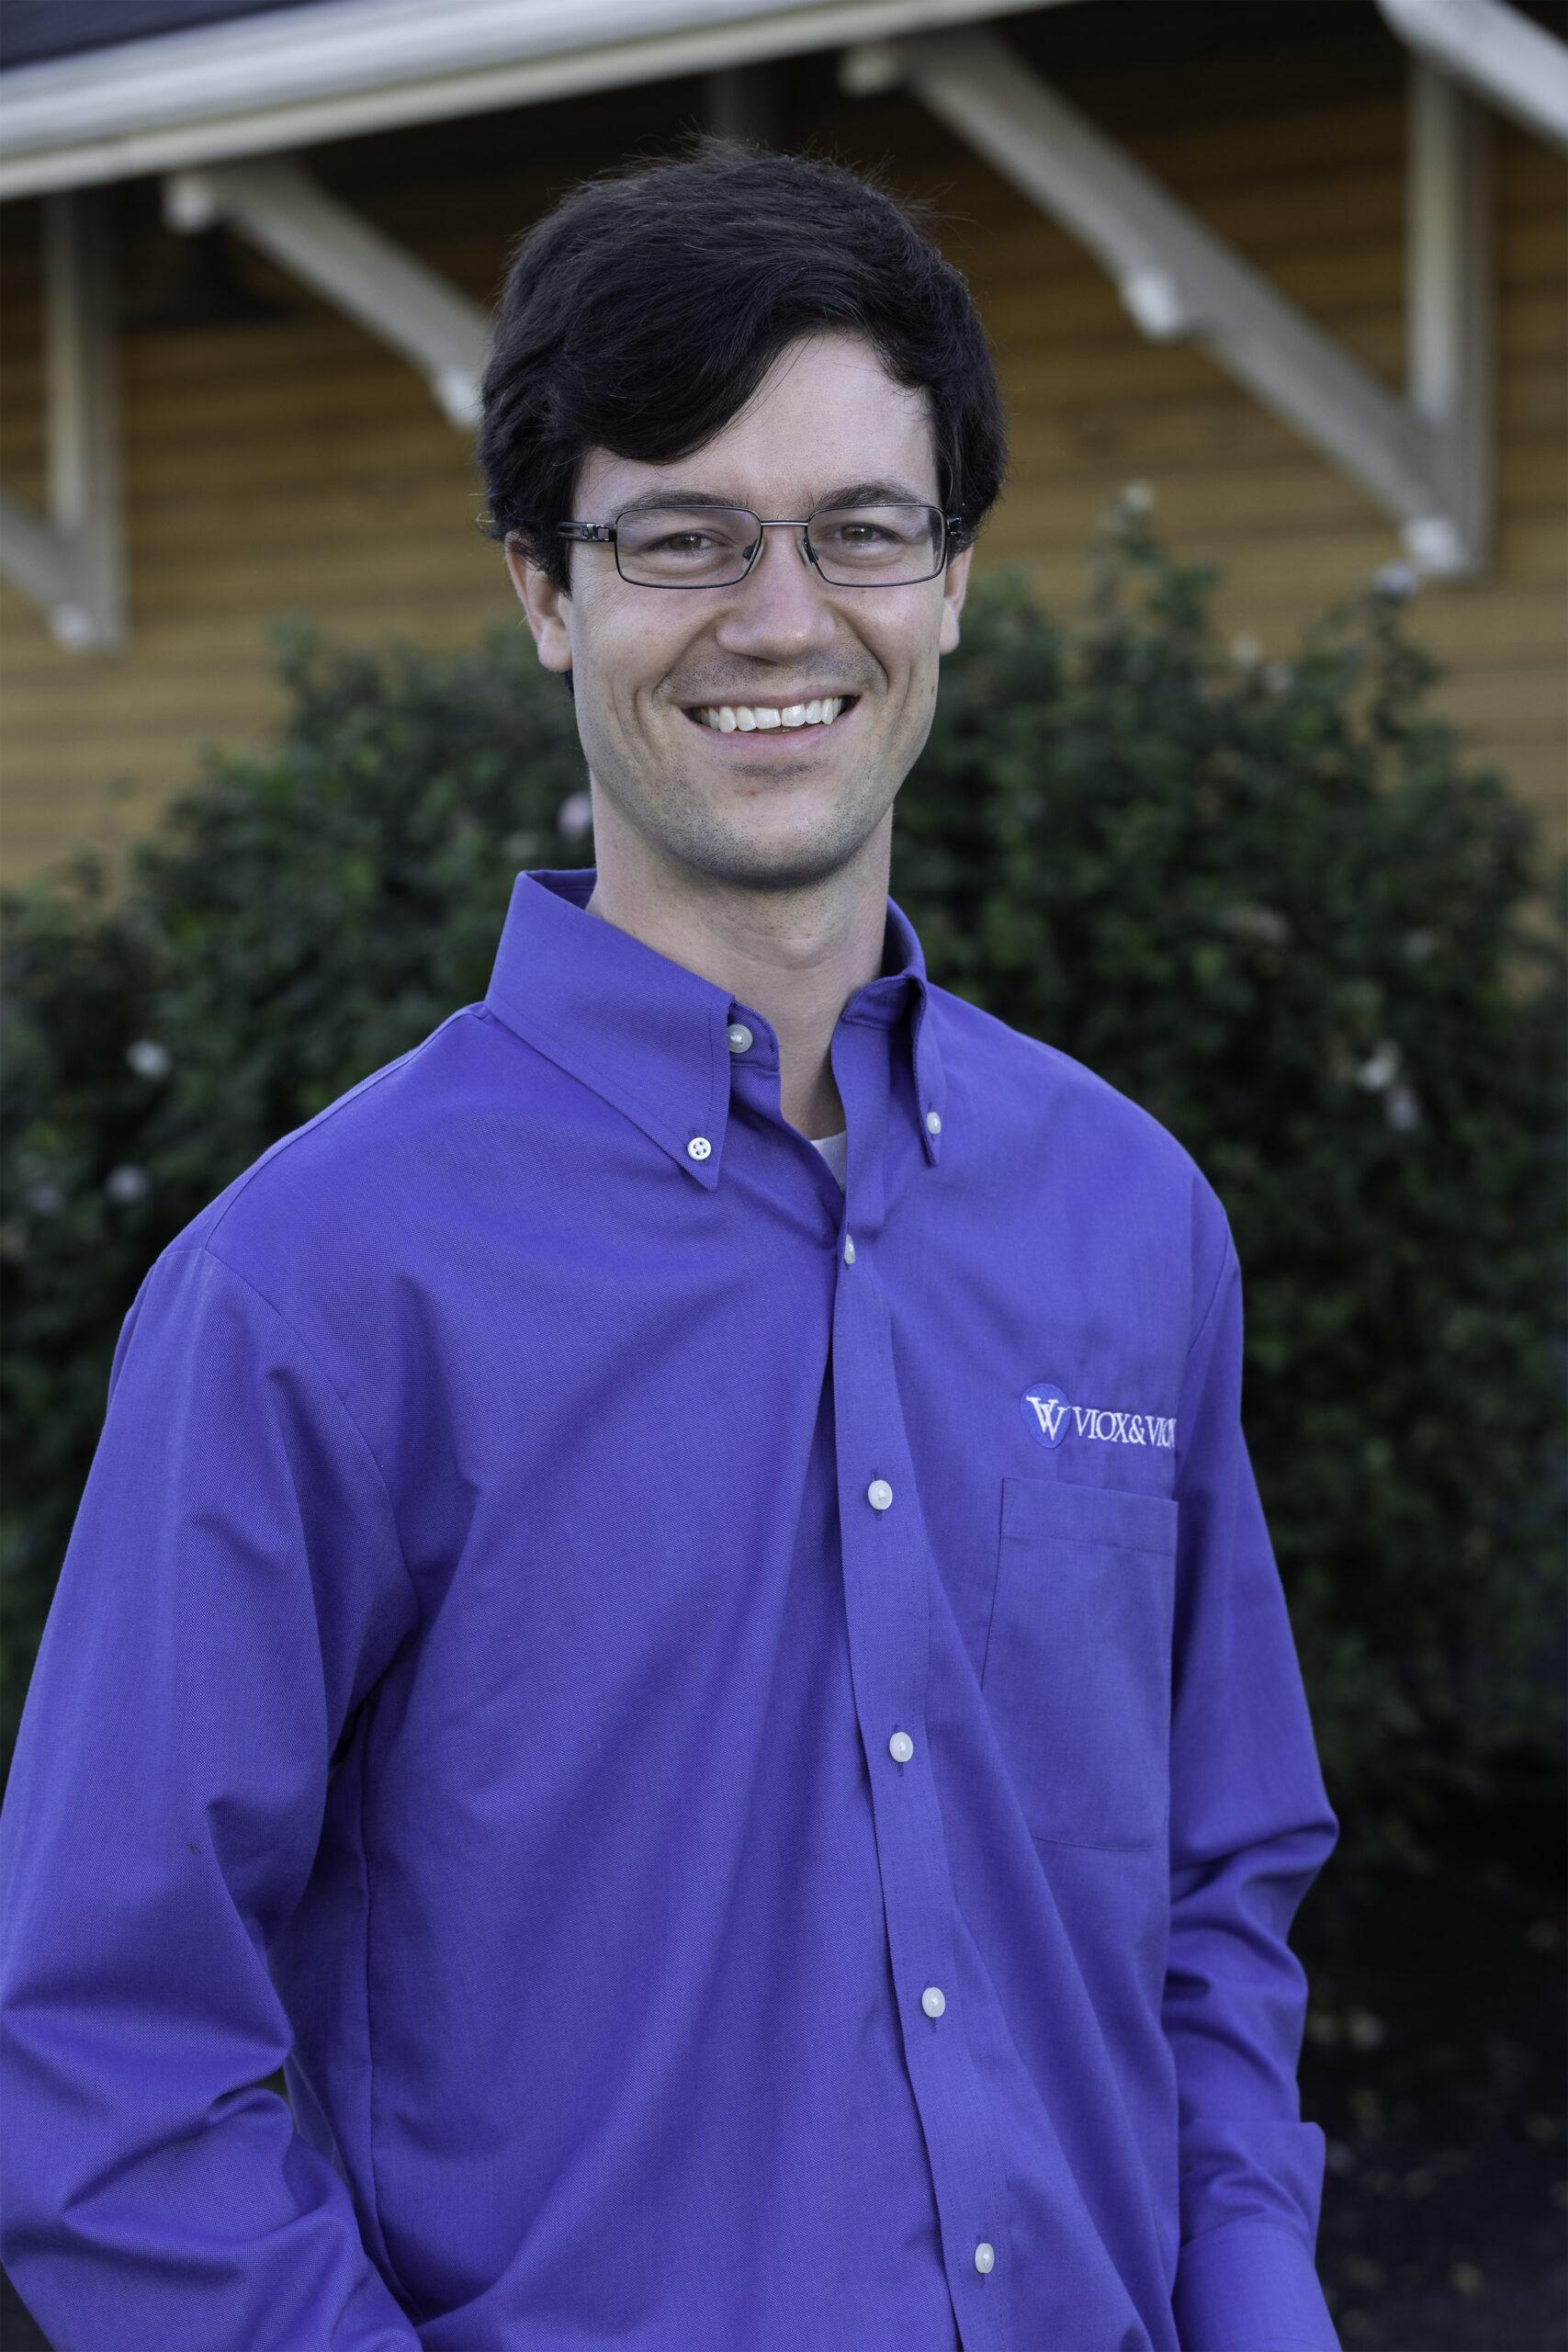 Jon Girdler : Professional Civil Engineer, Traffic Engineering Specialist